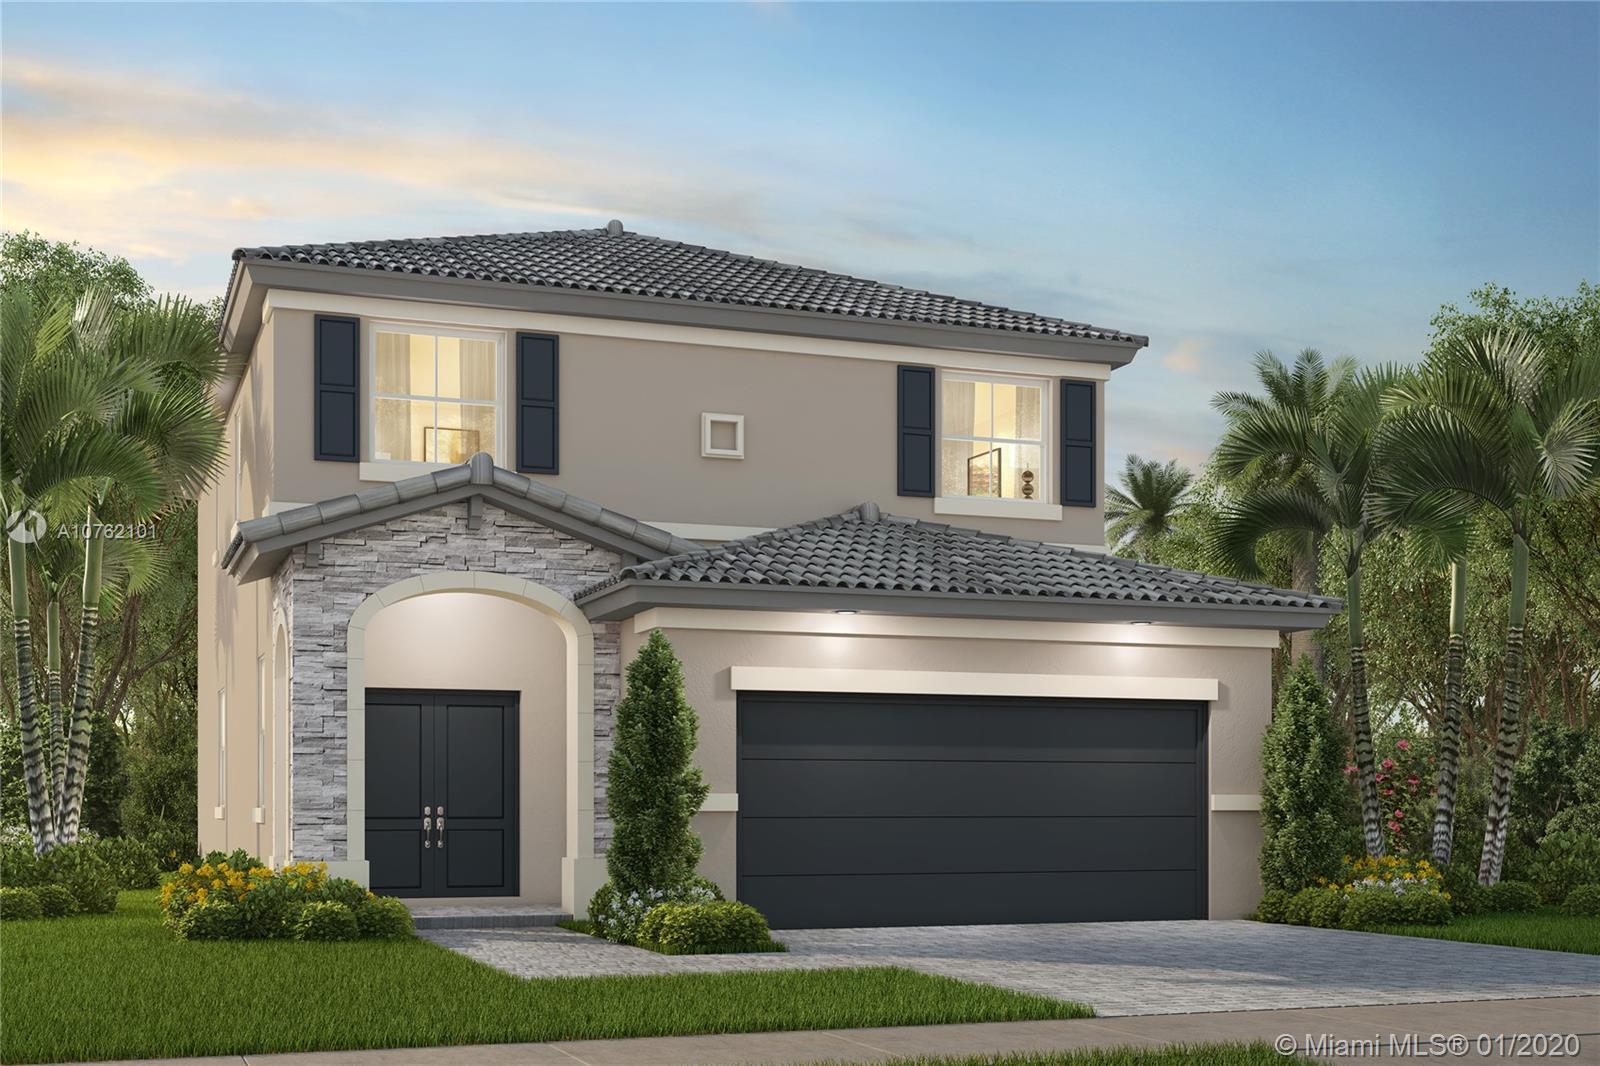 1429 SE 26 Terr, Homestead, FL 33033 - Homestead, FL real estate listing